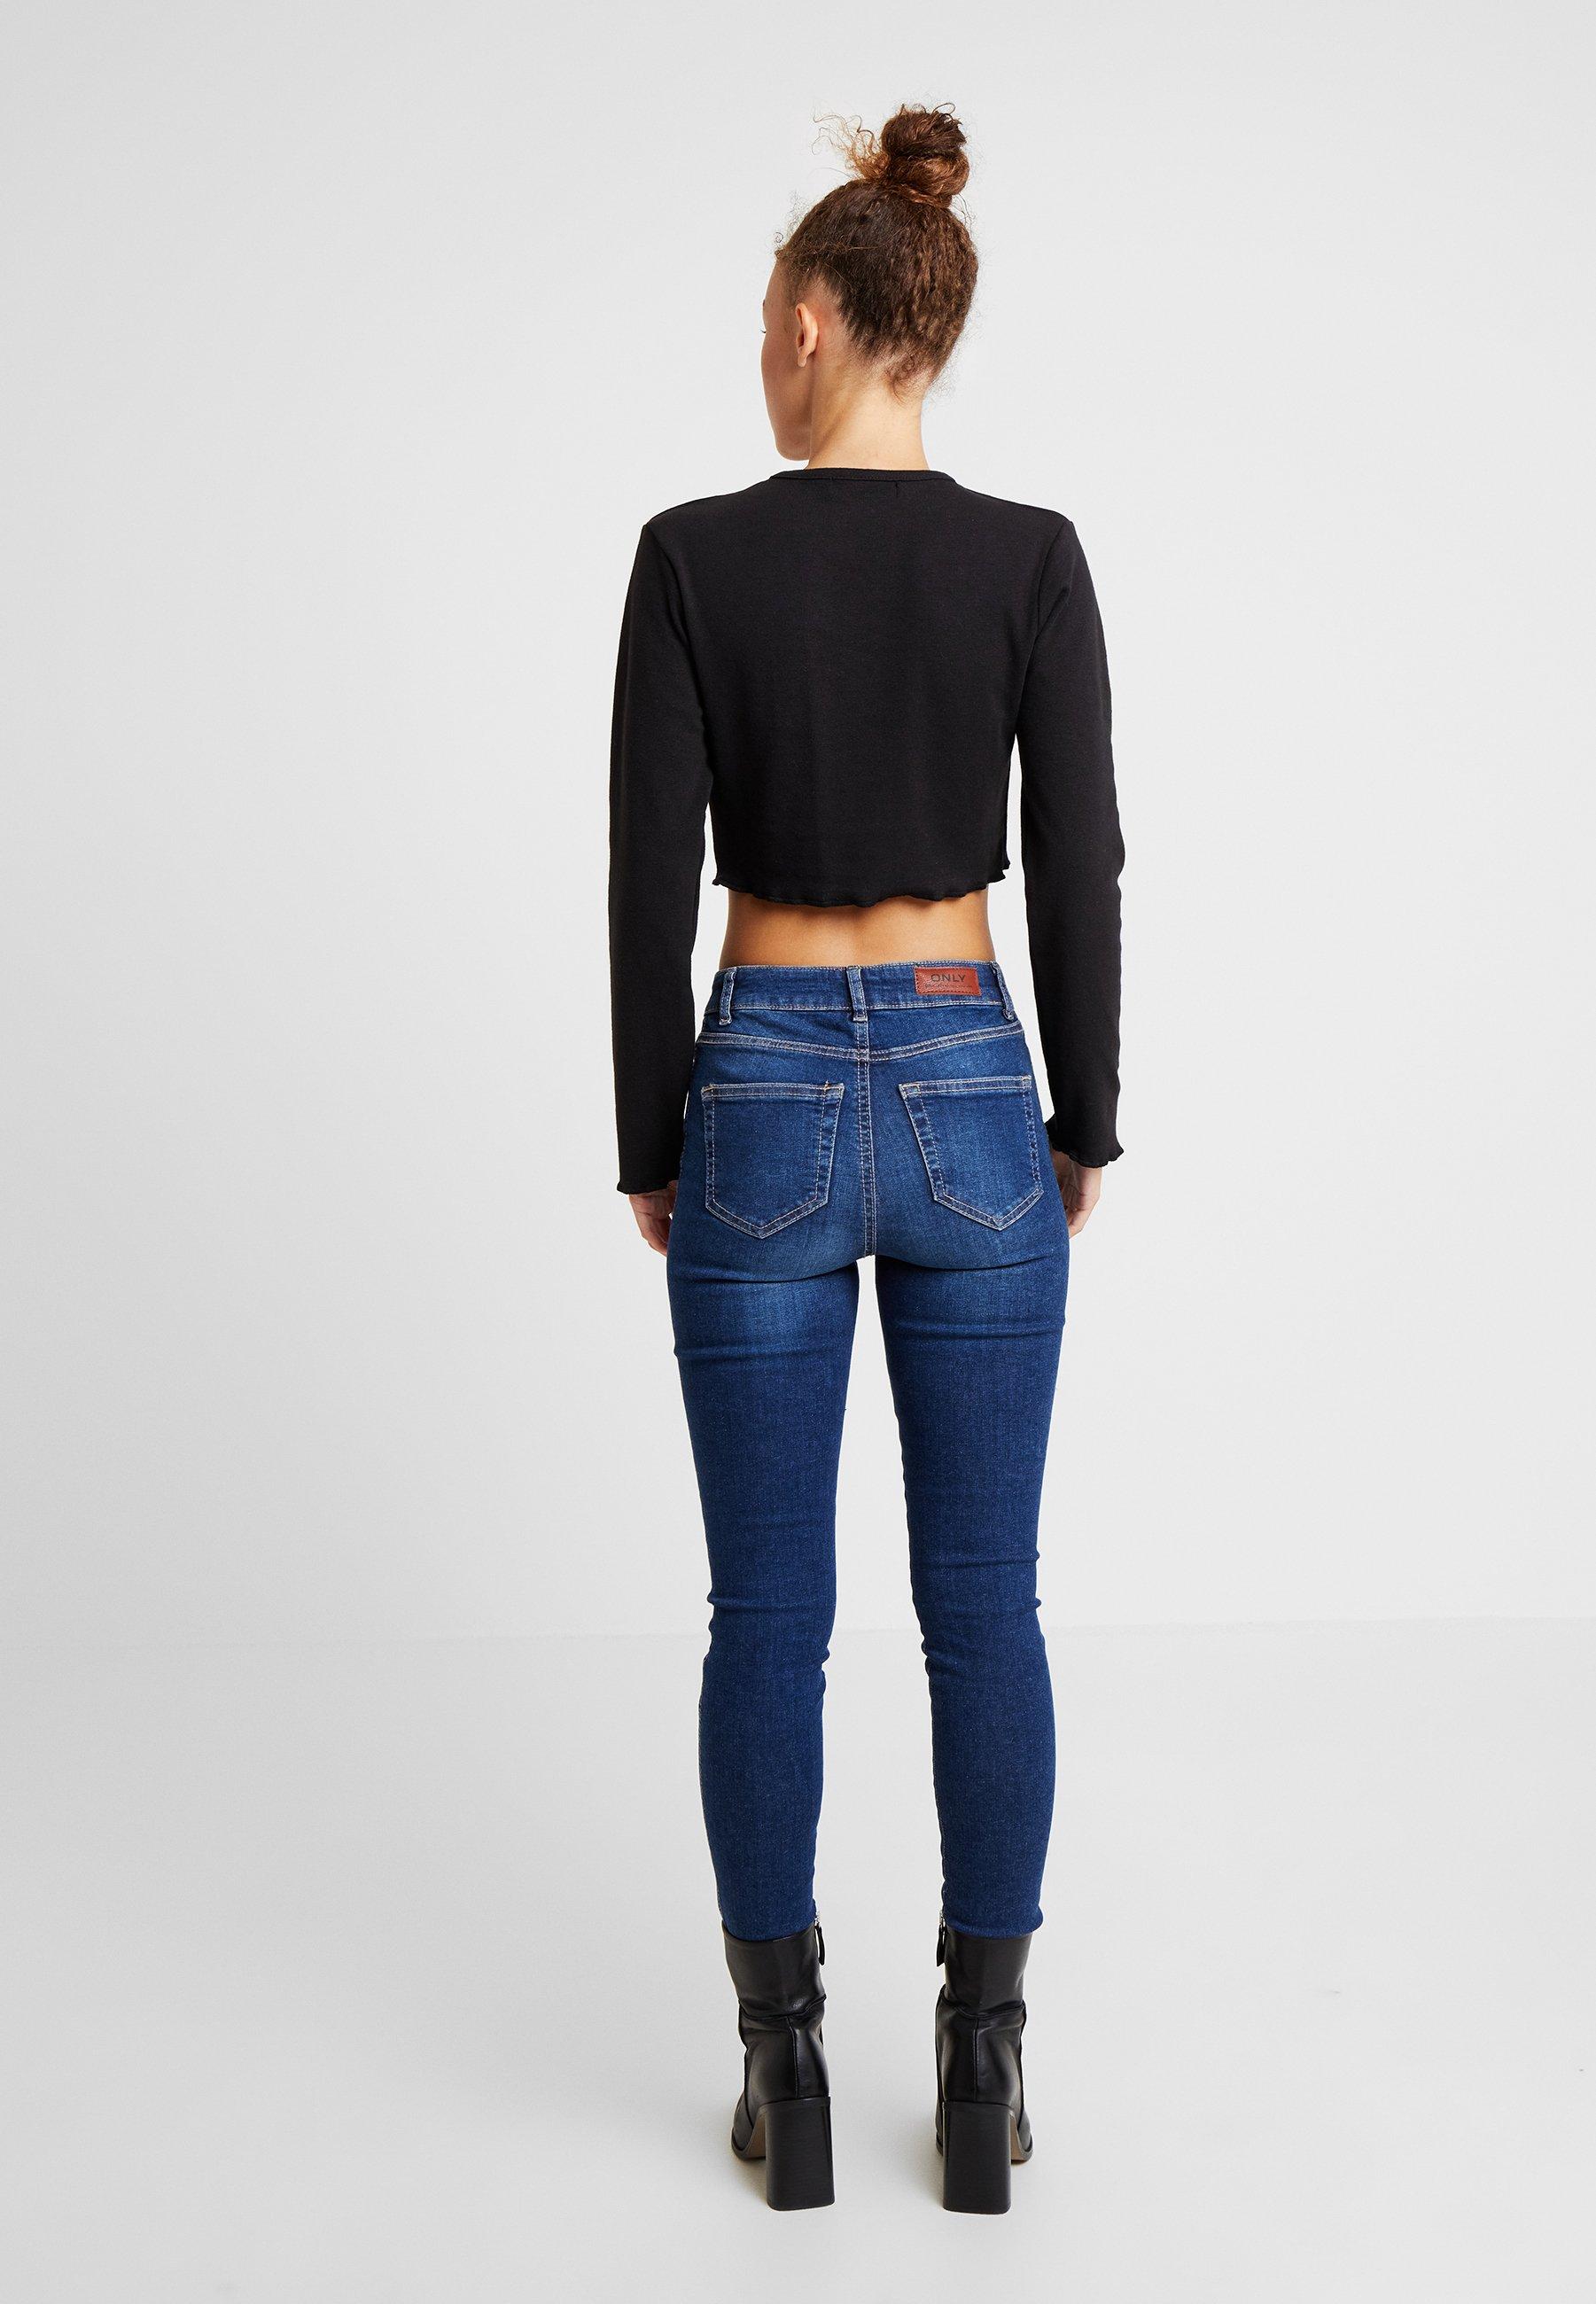 À Longues Lettuce Black camel Crop Long Missguided Manches 2 PackT Sleeve Petite shirt Hem MGVLqUSpz